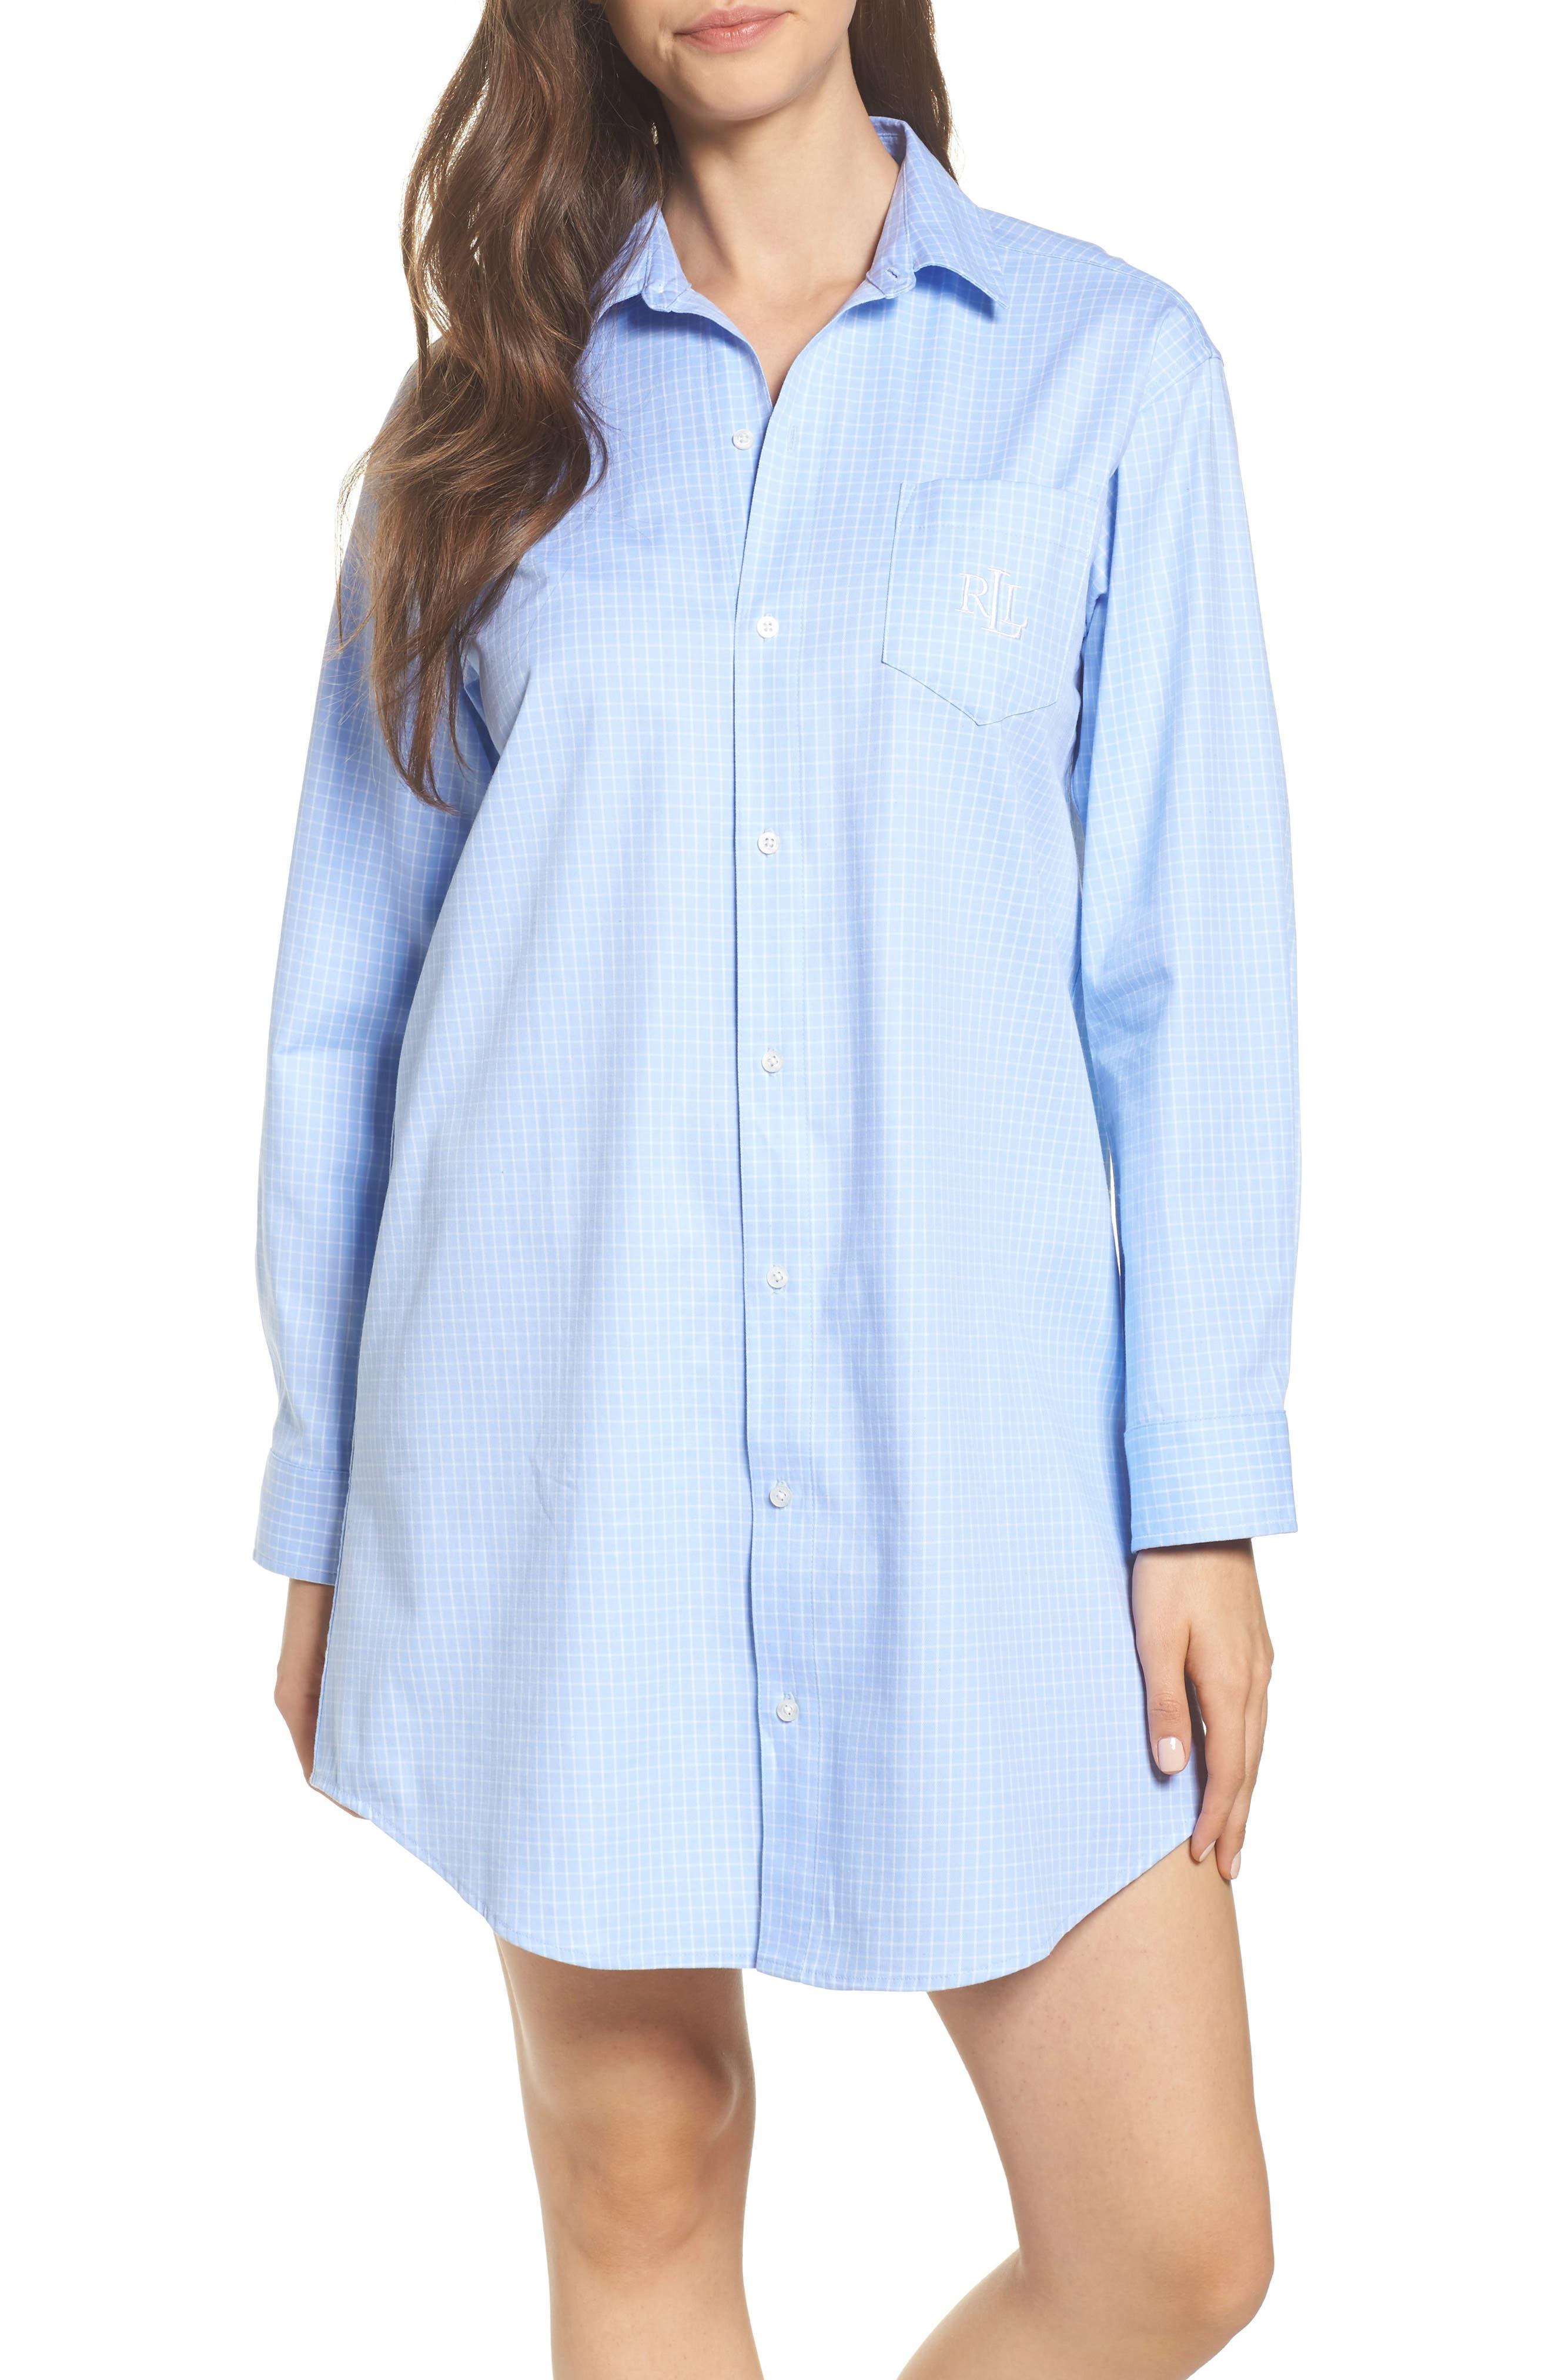 Alternate Image 1 Selected - Lauren Ralph Lauren Stretch Cotton Sleep Shirt